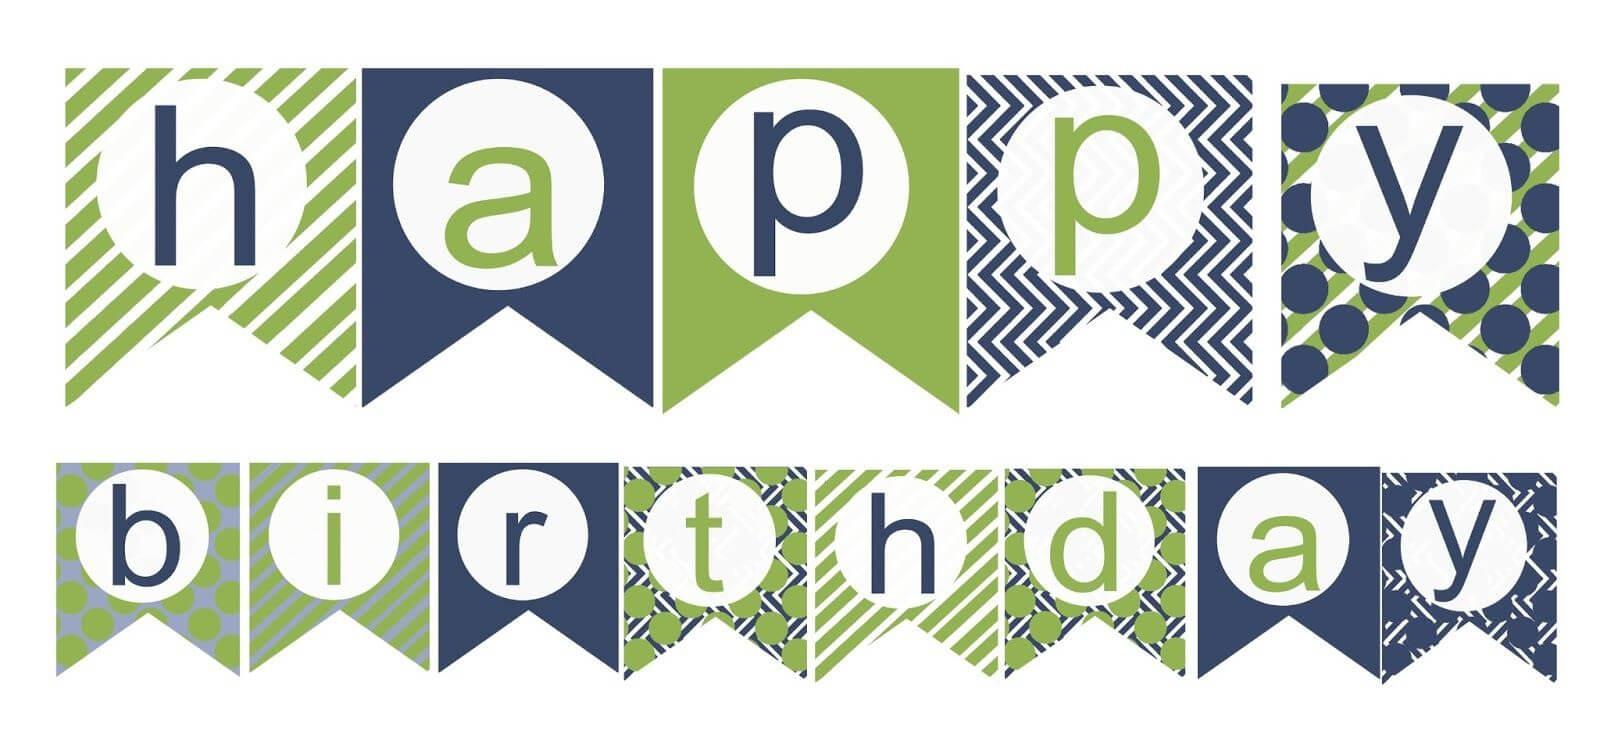 009 Happy Birthday Banner Template Unbelievable Ideas Throughout Free Happy Birthday Banner Templates Download